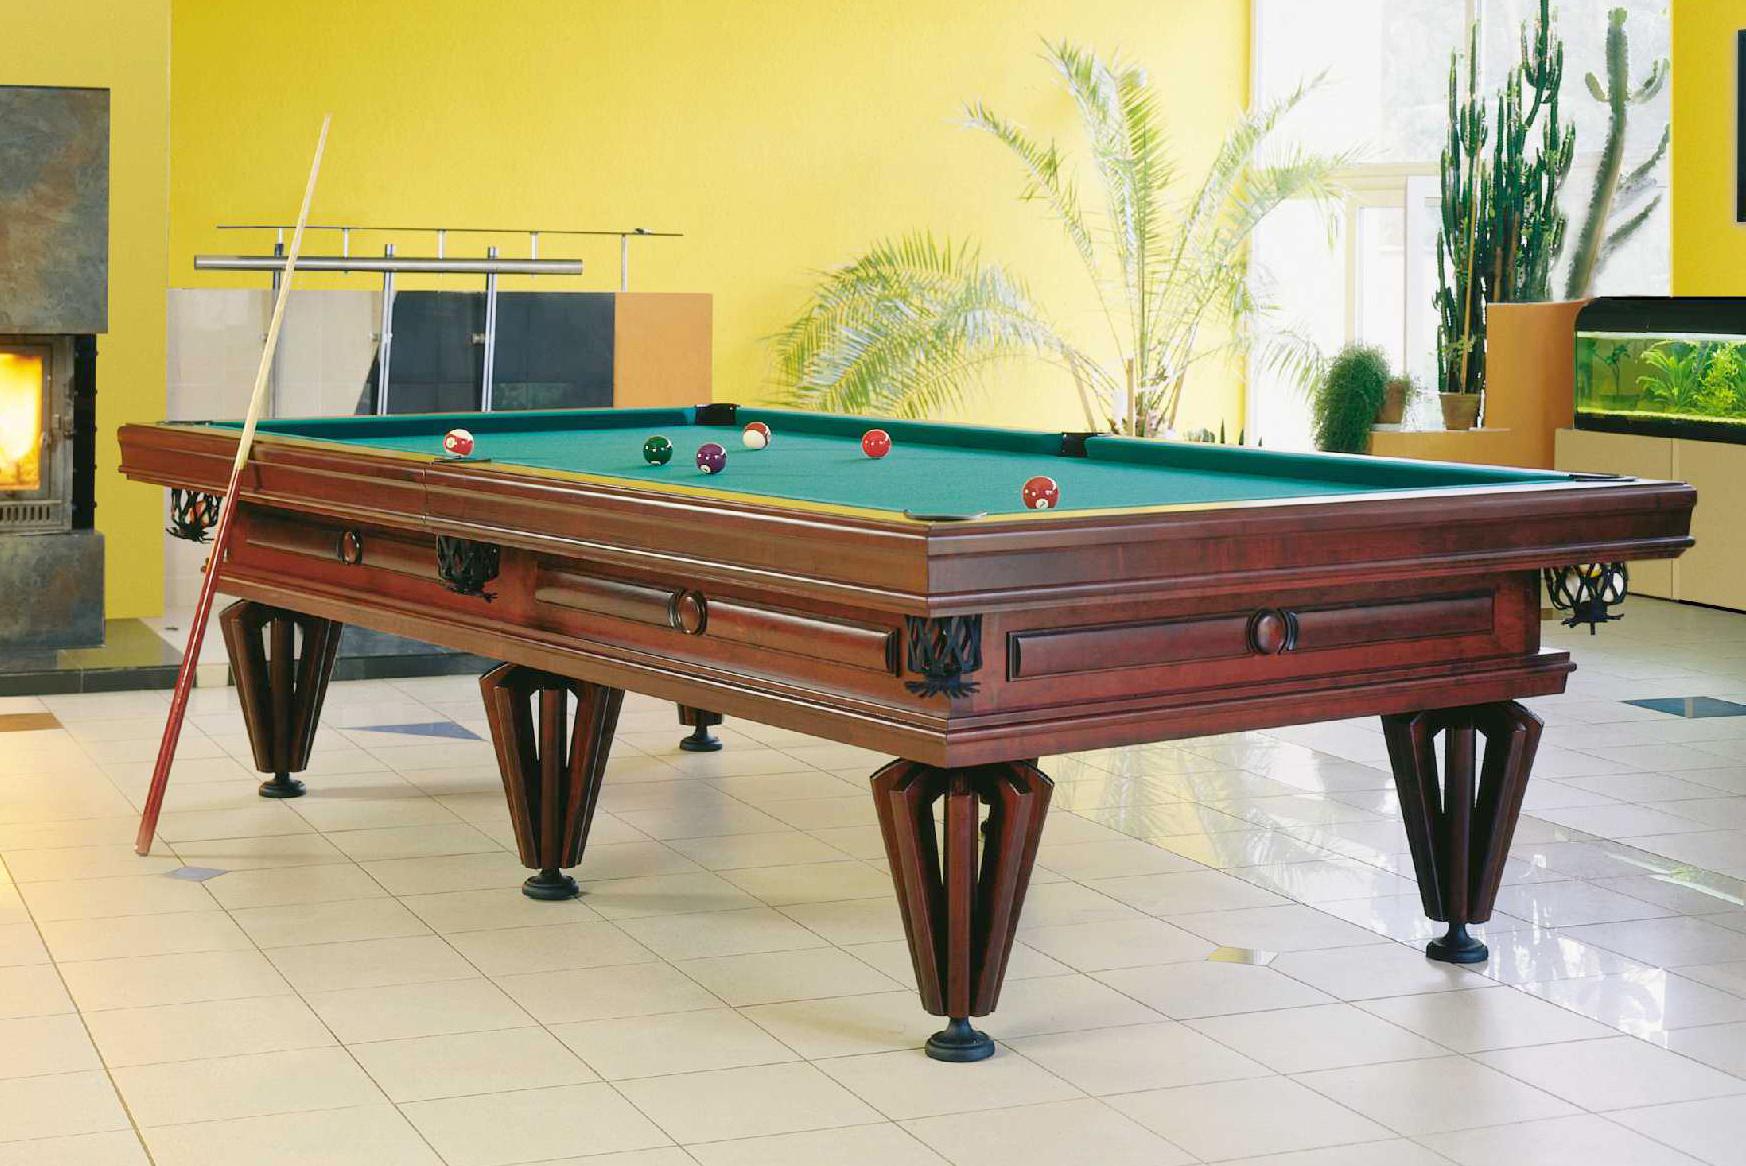 Poisedon Deco Pool table copy